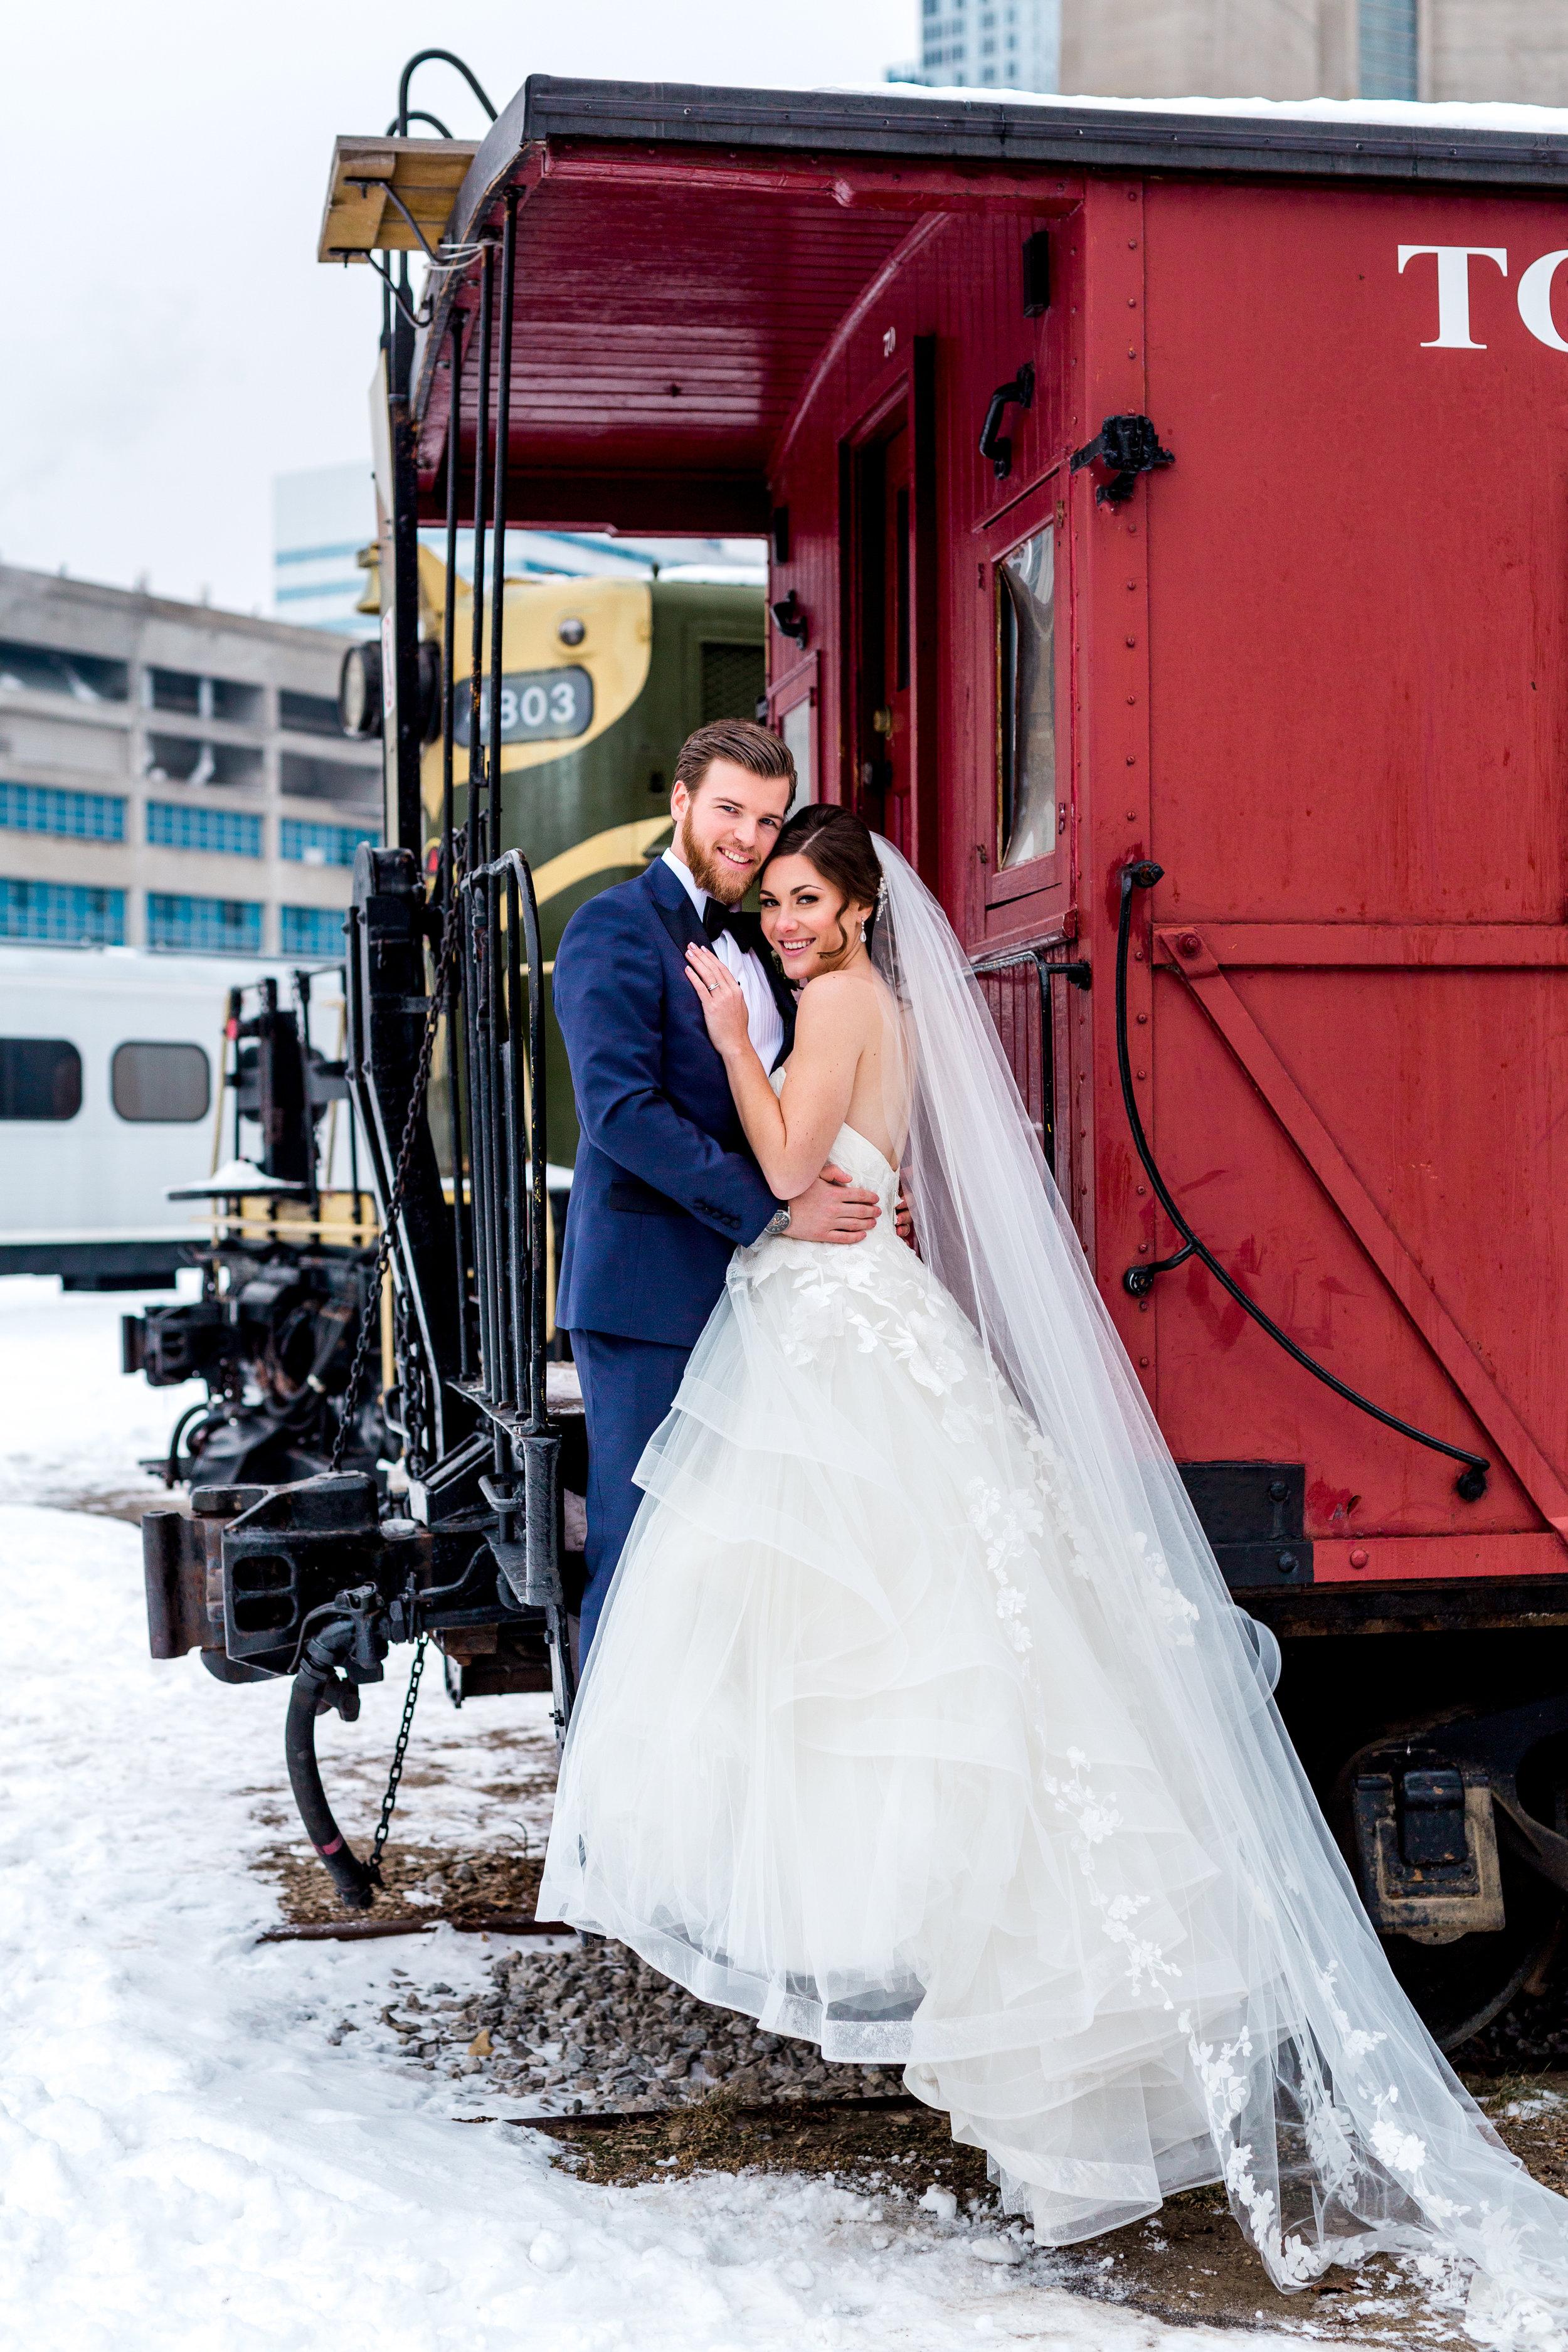 Amir_Danielle_Whitfield_Wedding_Steam_Whistle_Toronto_330.jpg